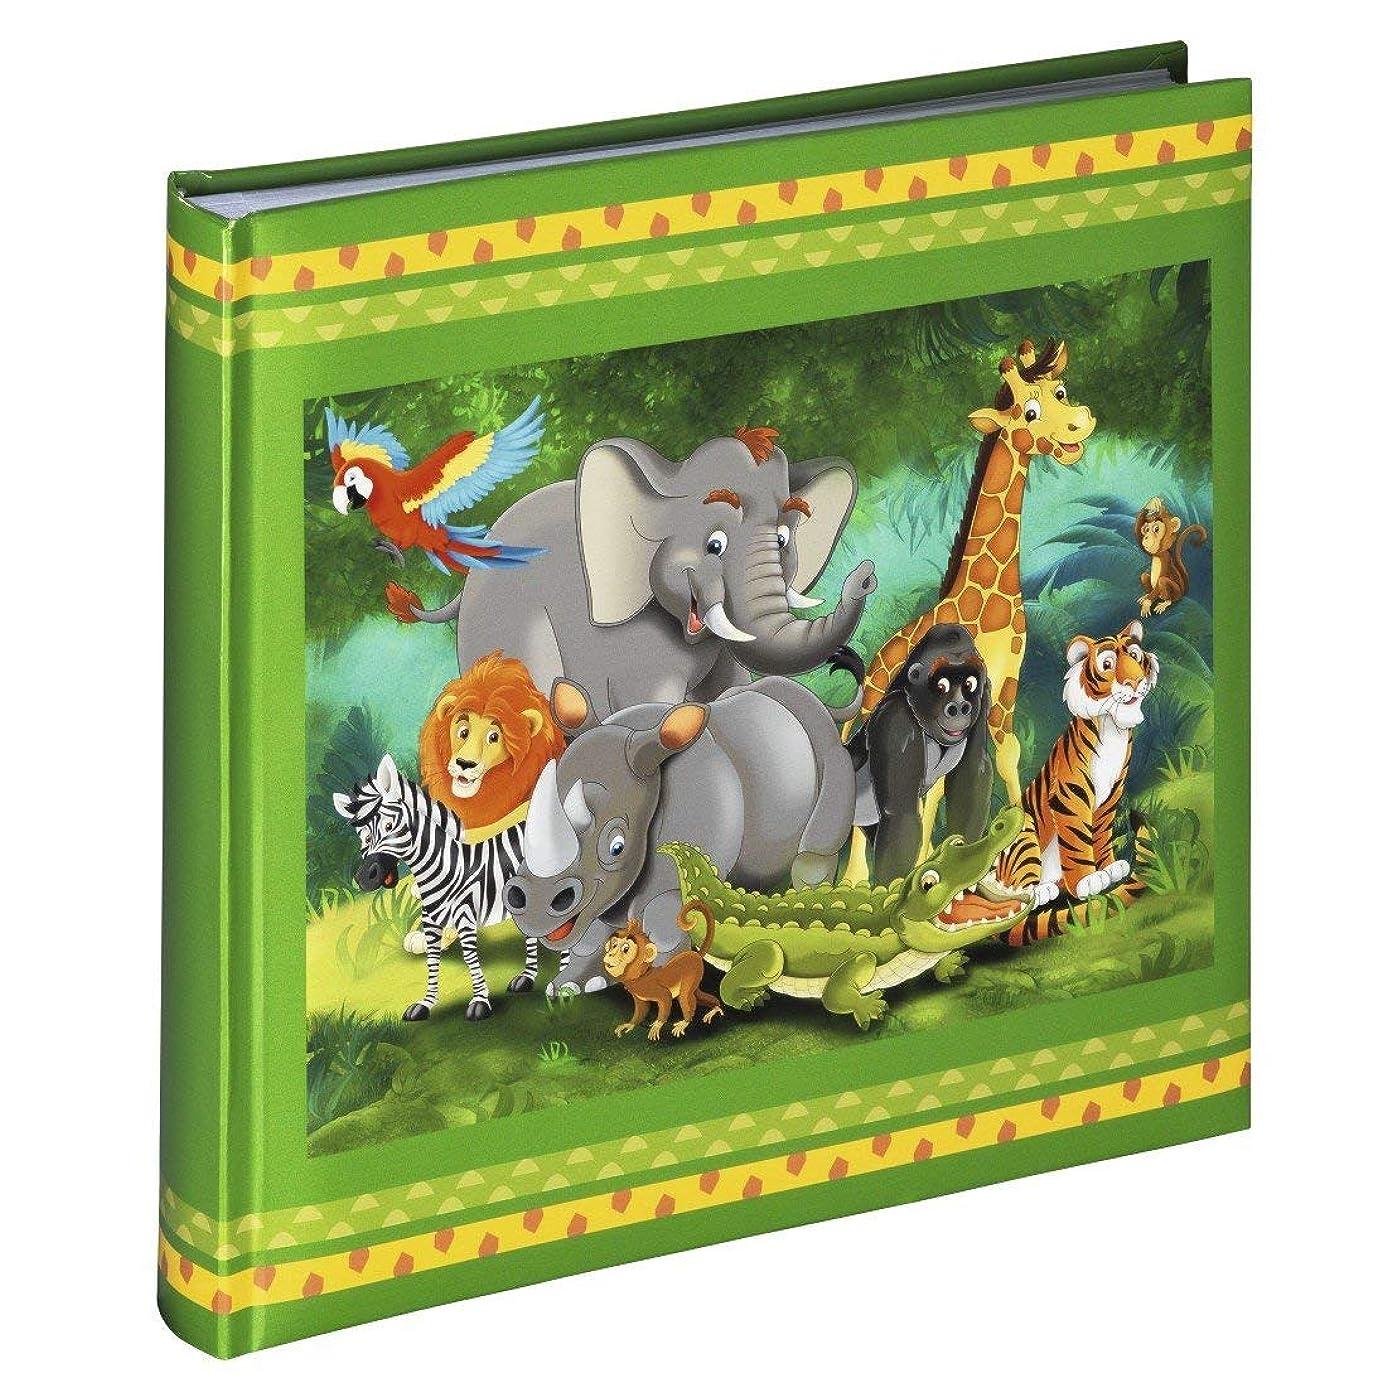 Hama Photo Album with 50 Pages 100 Photos Sized 10 x 15 Photo Book Jungle Animals (Children Colorful Animals Jungle Photo Album Green 25 x 25 cm).